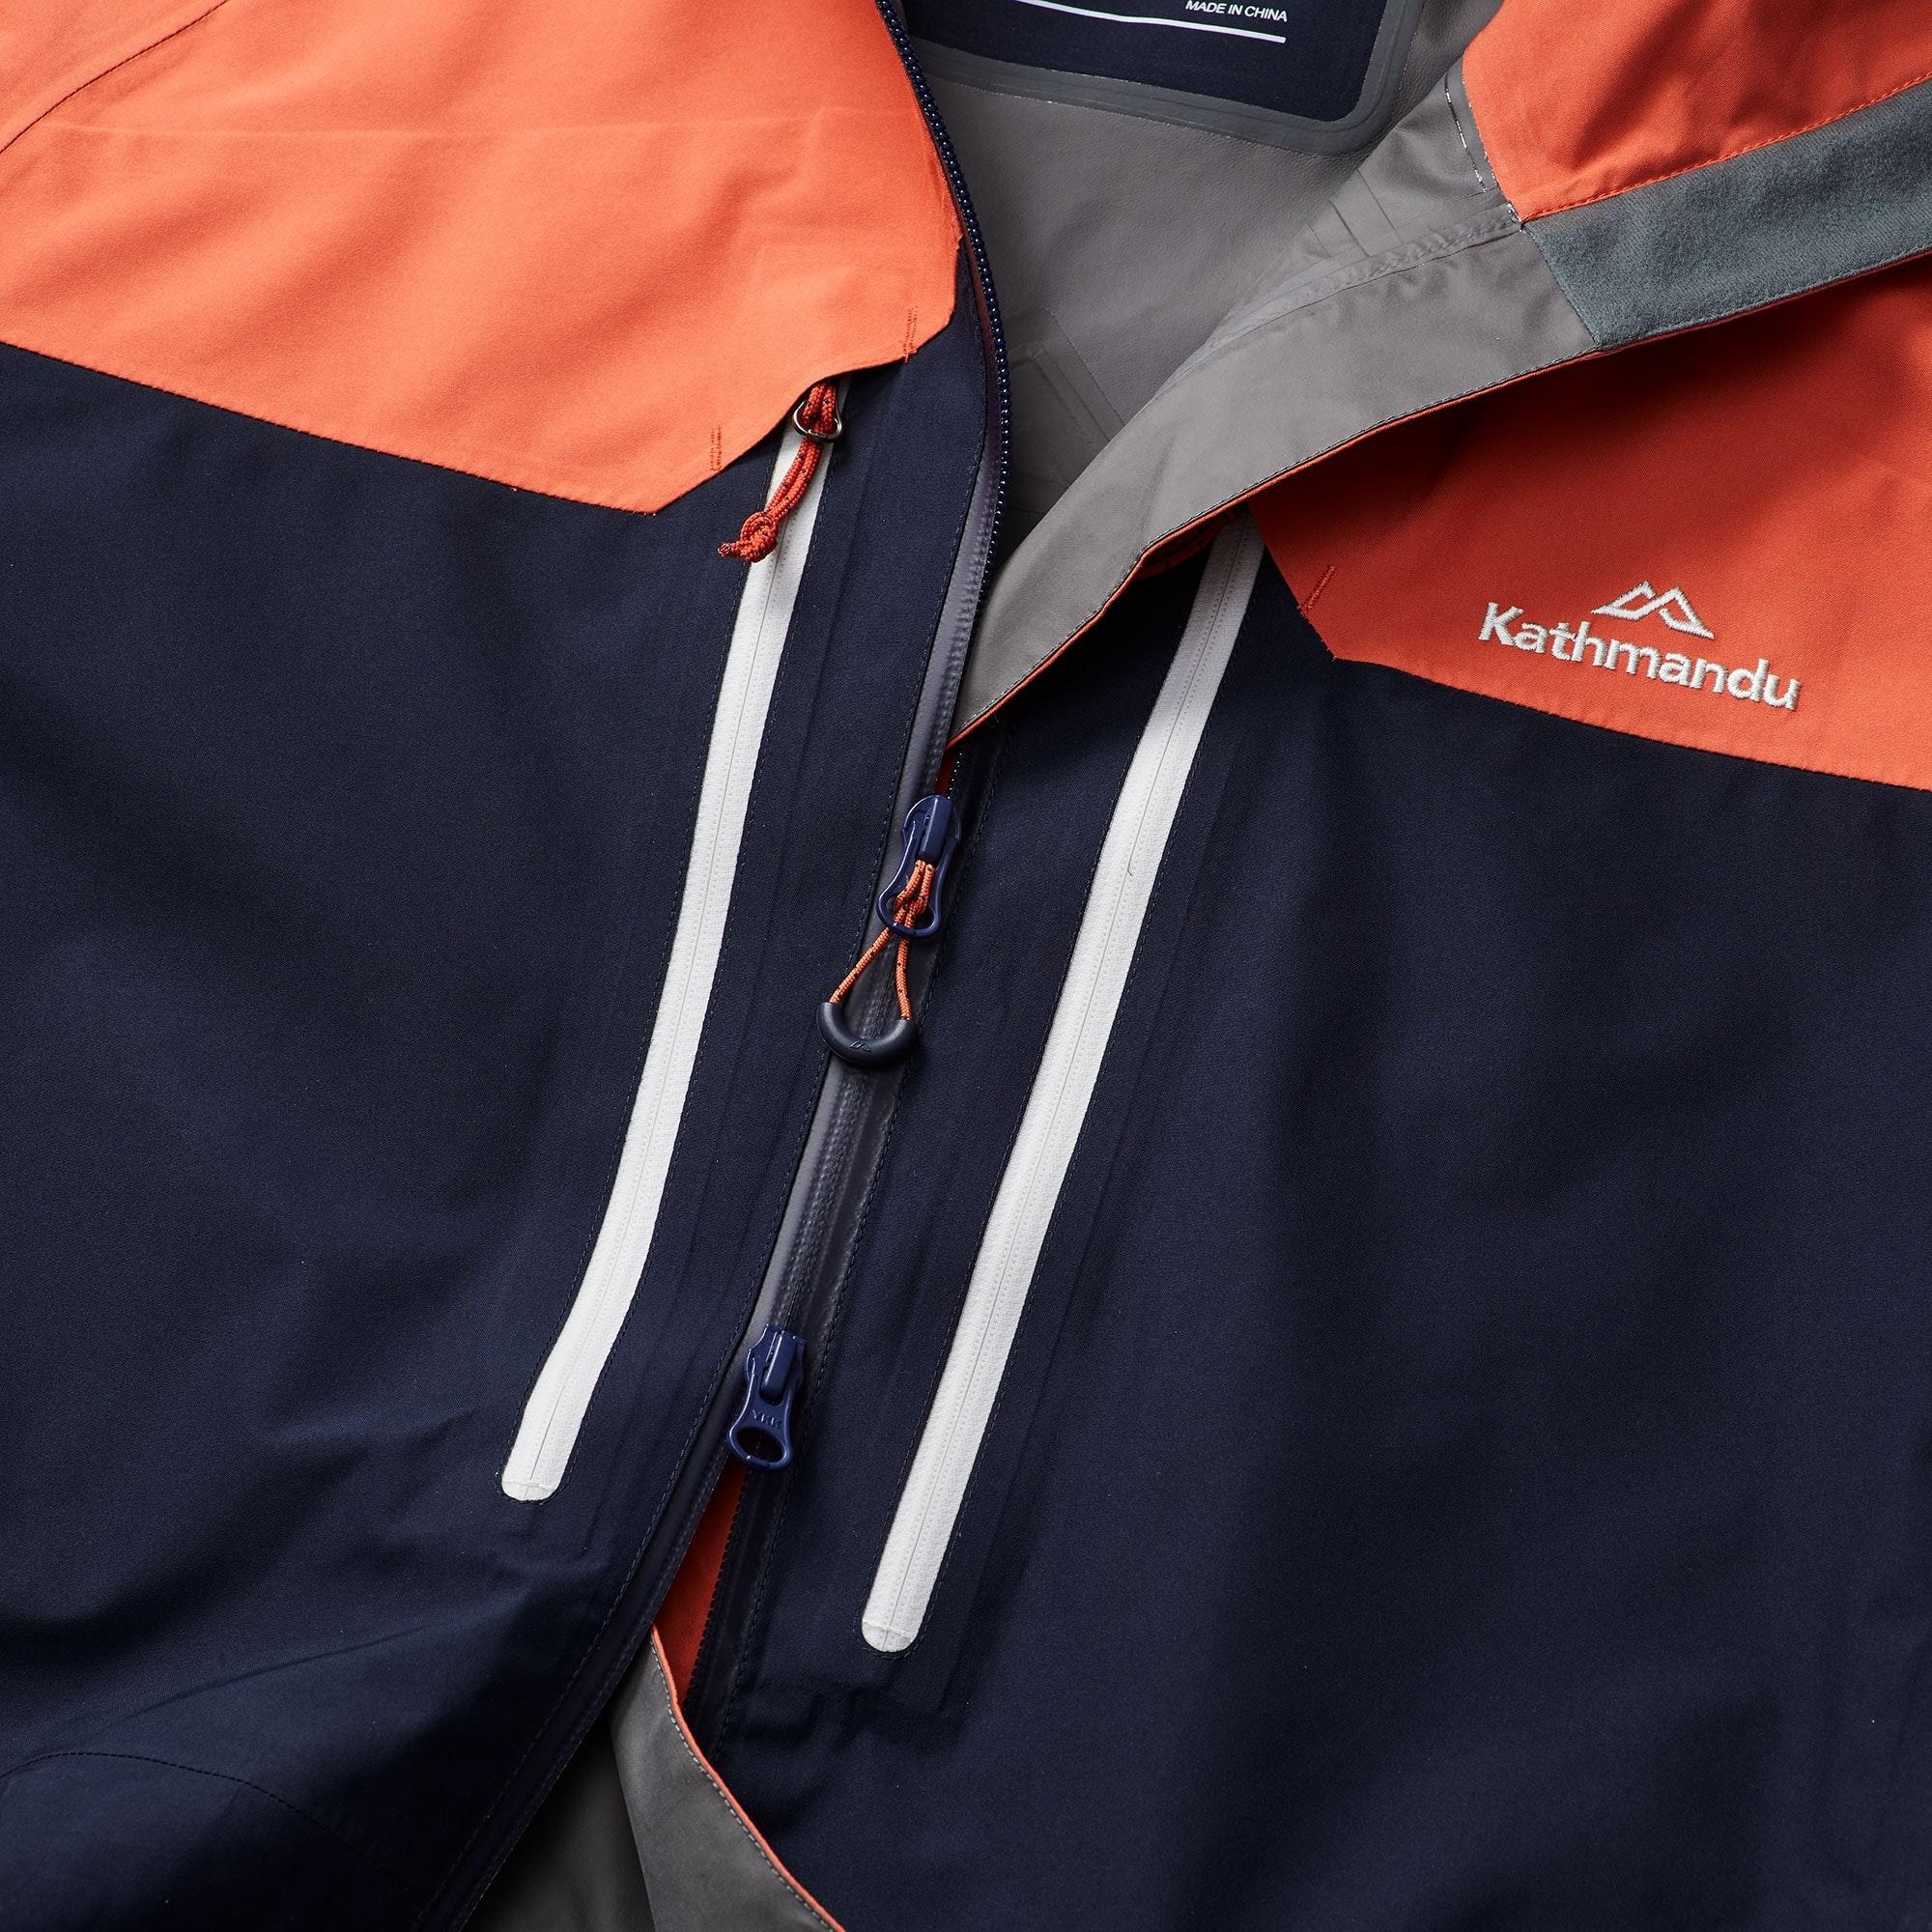 NEW-Kathmandu-Aysen-Men-039-s-GORE-TEX-Windproof-Waterproof-Outdoor-Rain-Jacket thumbnail 14